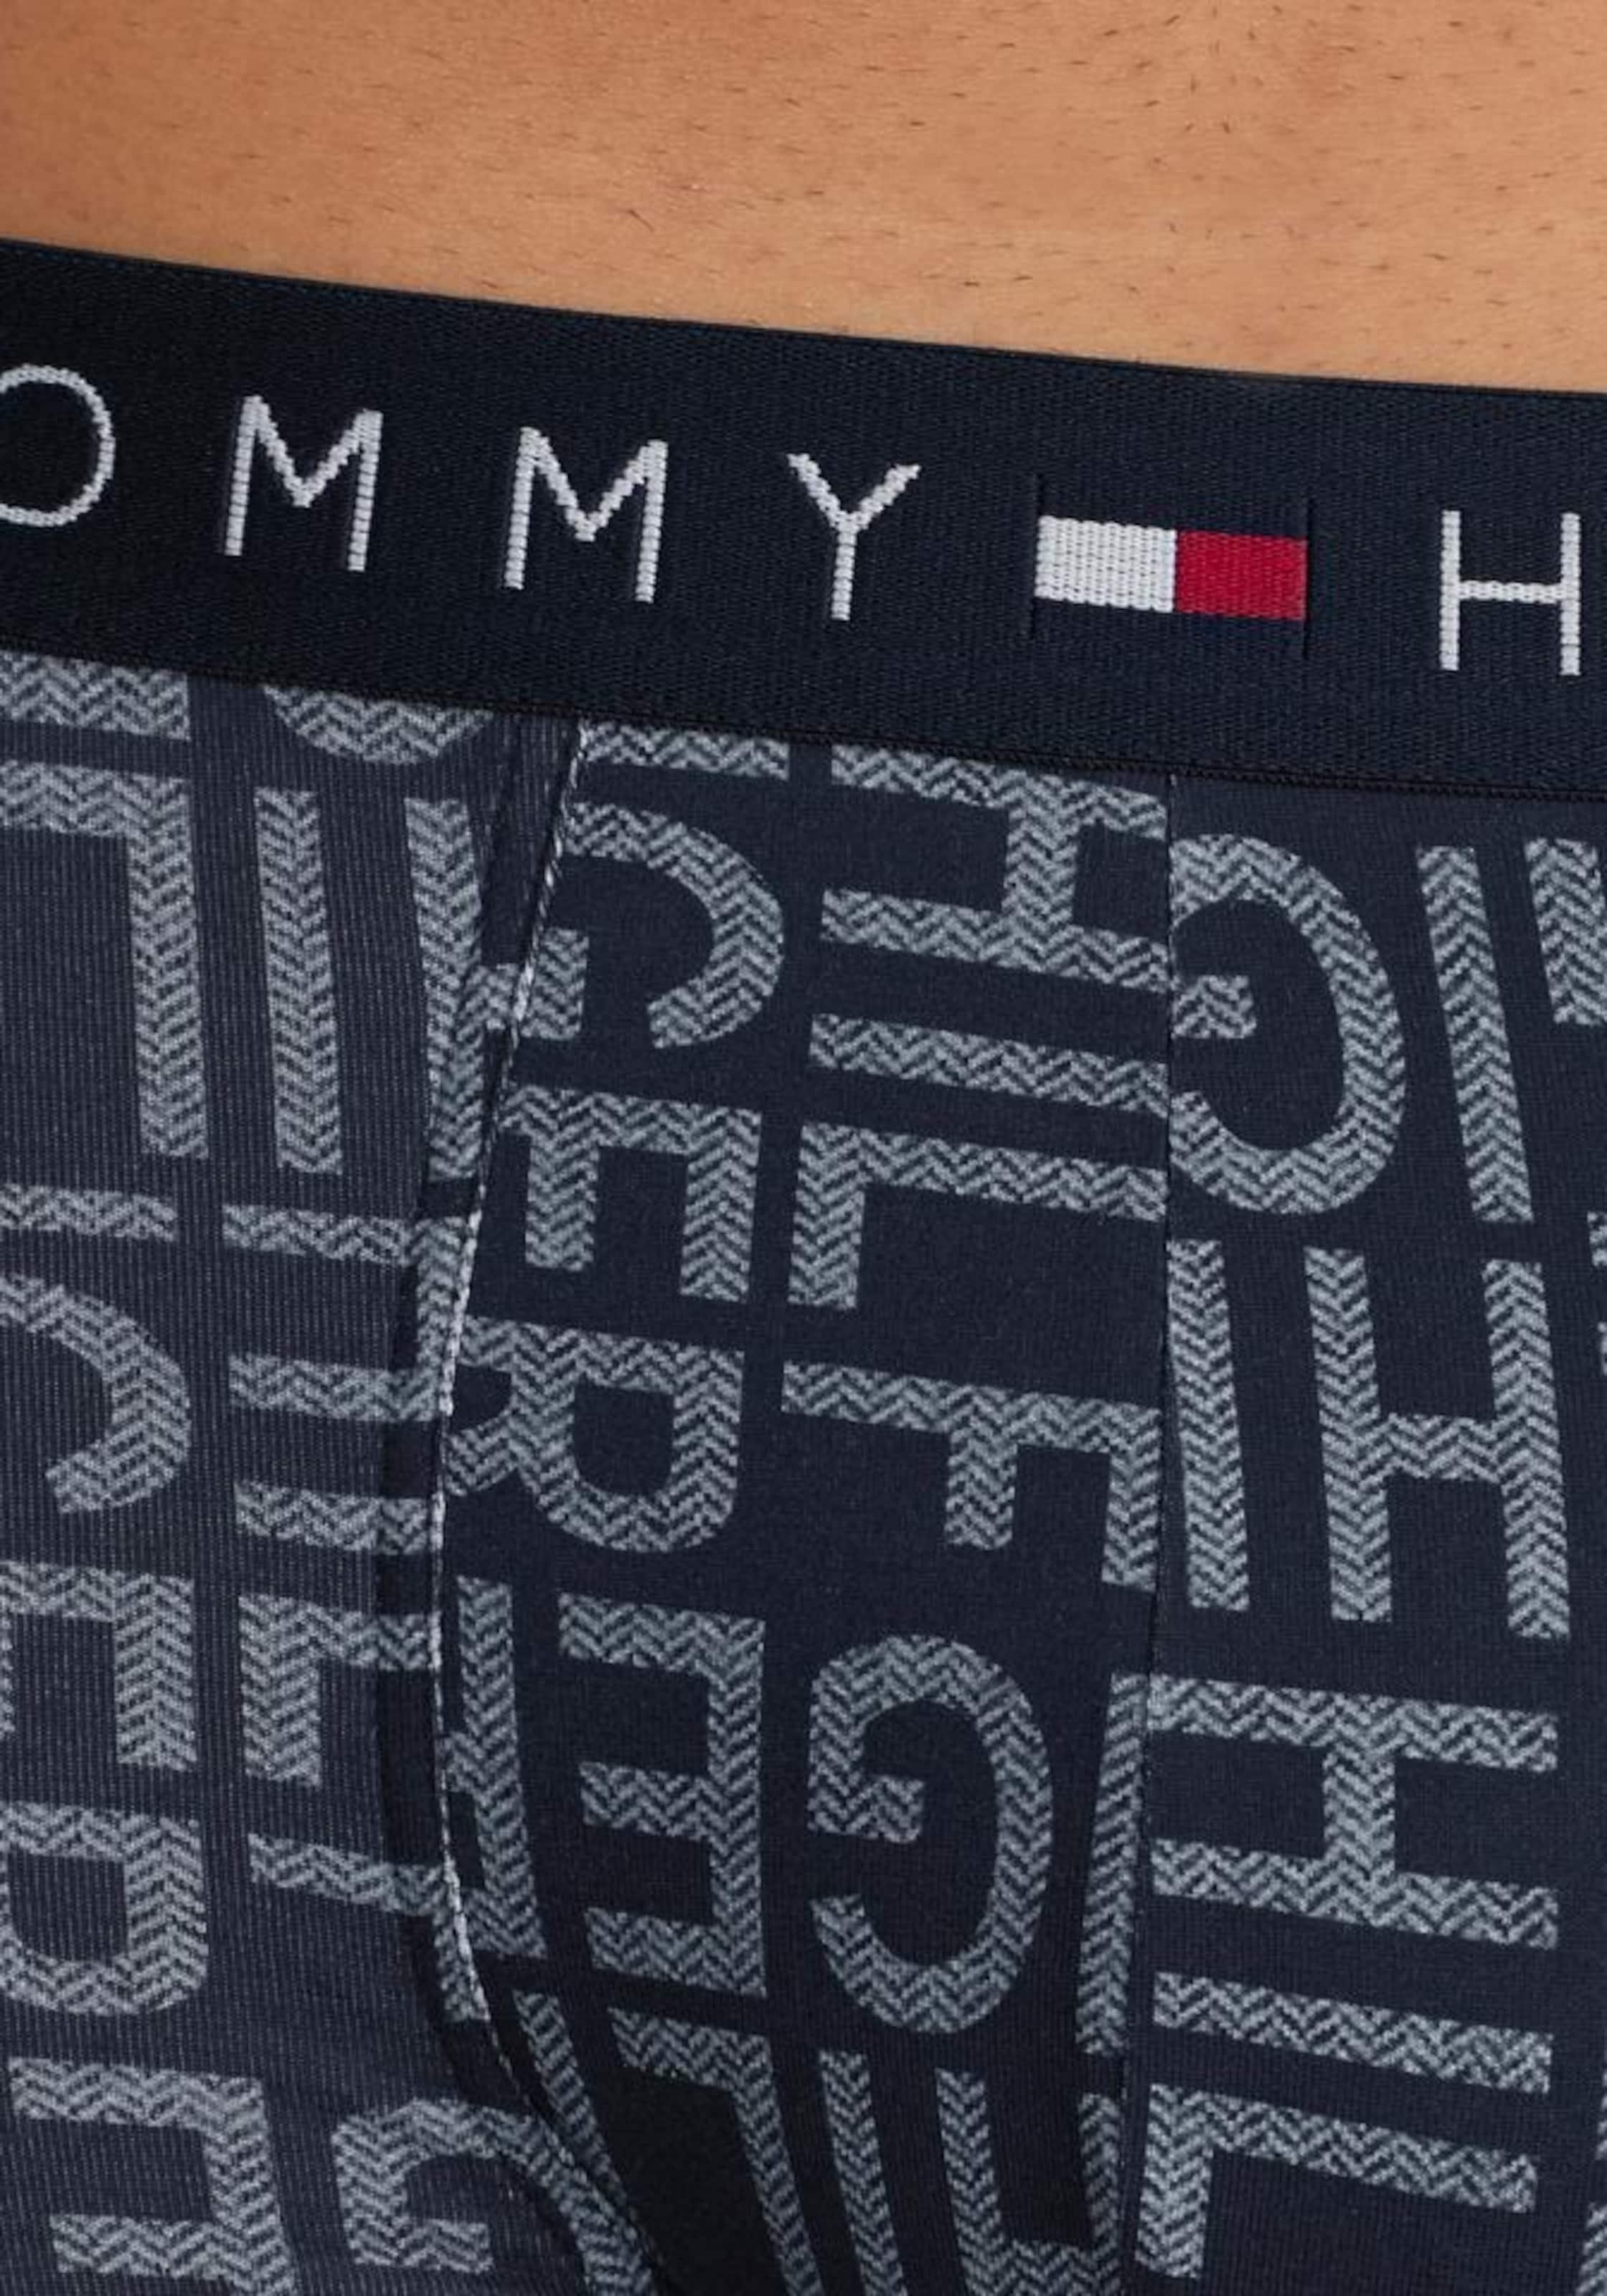 TOMMY HILFIGER Boxer 'Cotton' Freies Verschiffen Bester Großhandel Xlt4J